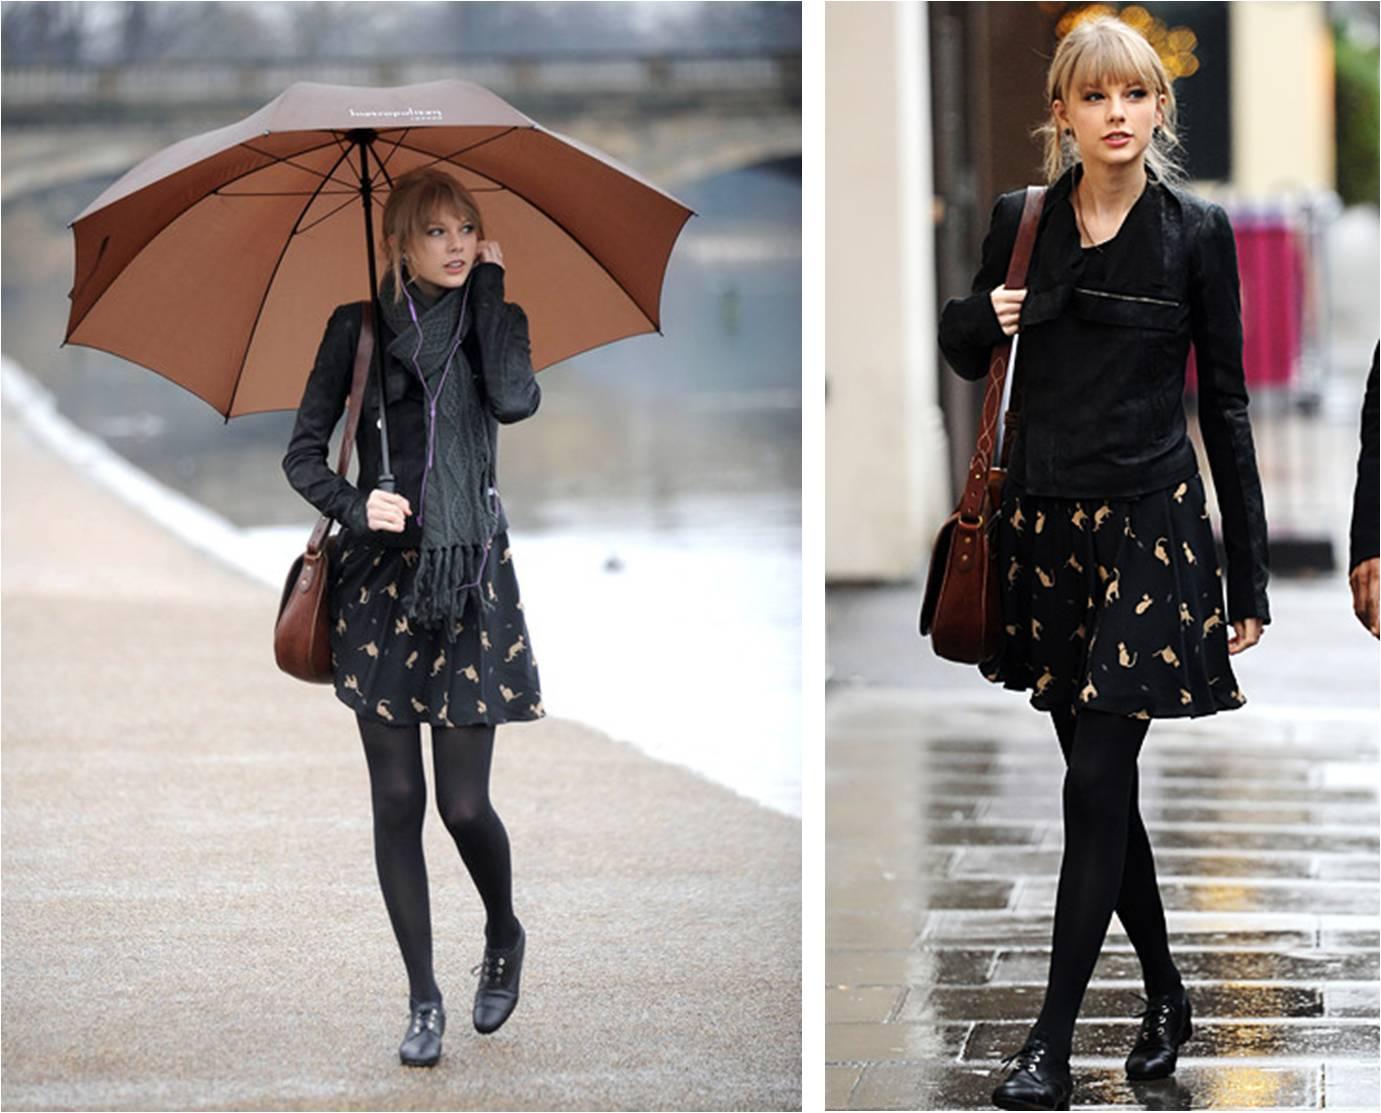 http://2.bp.blogspot.com/-A1iP9814-uY/UNscrH9yLrI/AAAAAAAAEfk/M1Cvu4tw_V0/s1600/Taylor+Swift+Style+London+Jan+12.jpg